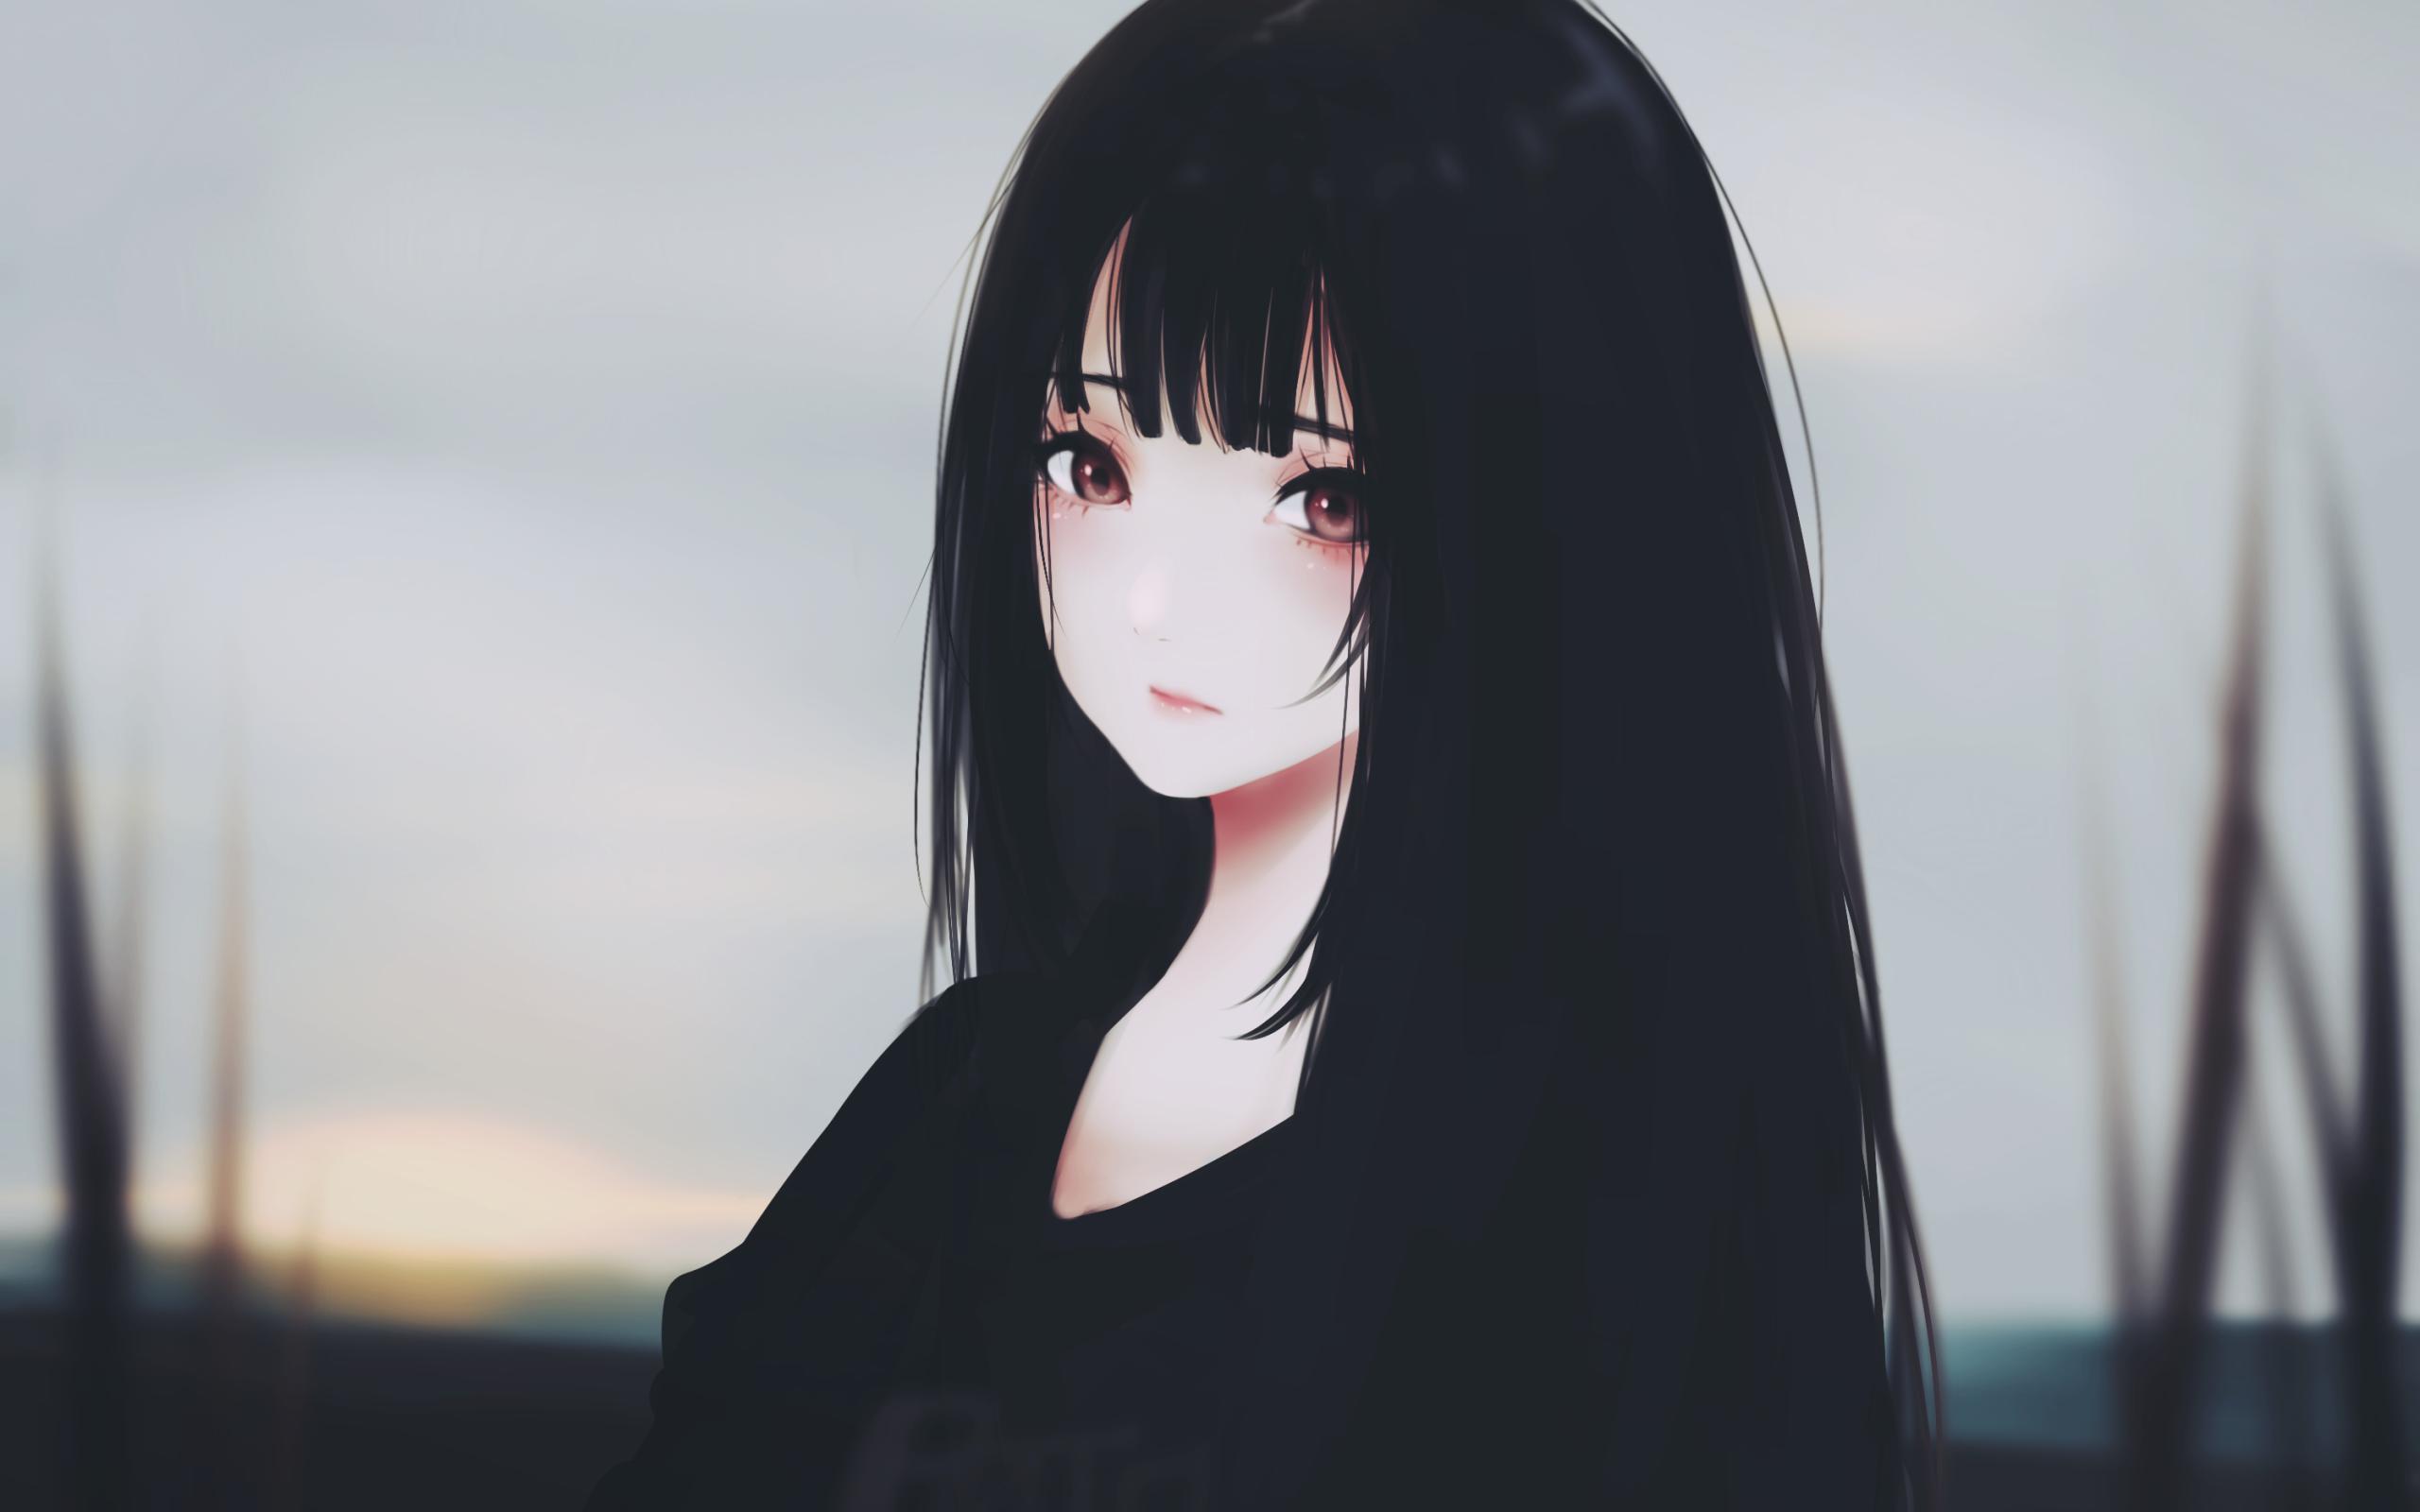 Anime Girl, Black Hair, Sad Expression, Semi Realistic - Beautiful Long Hair Anime Girl - HD Wallpaper